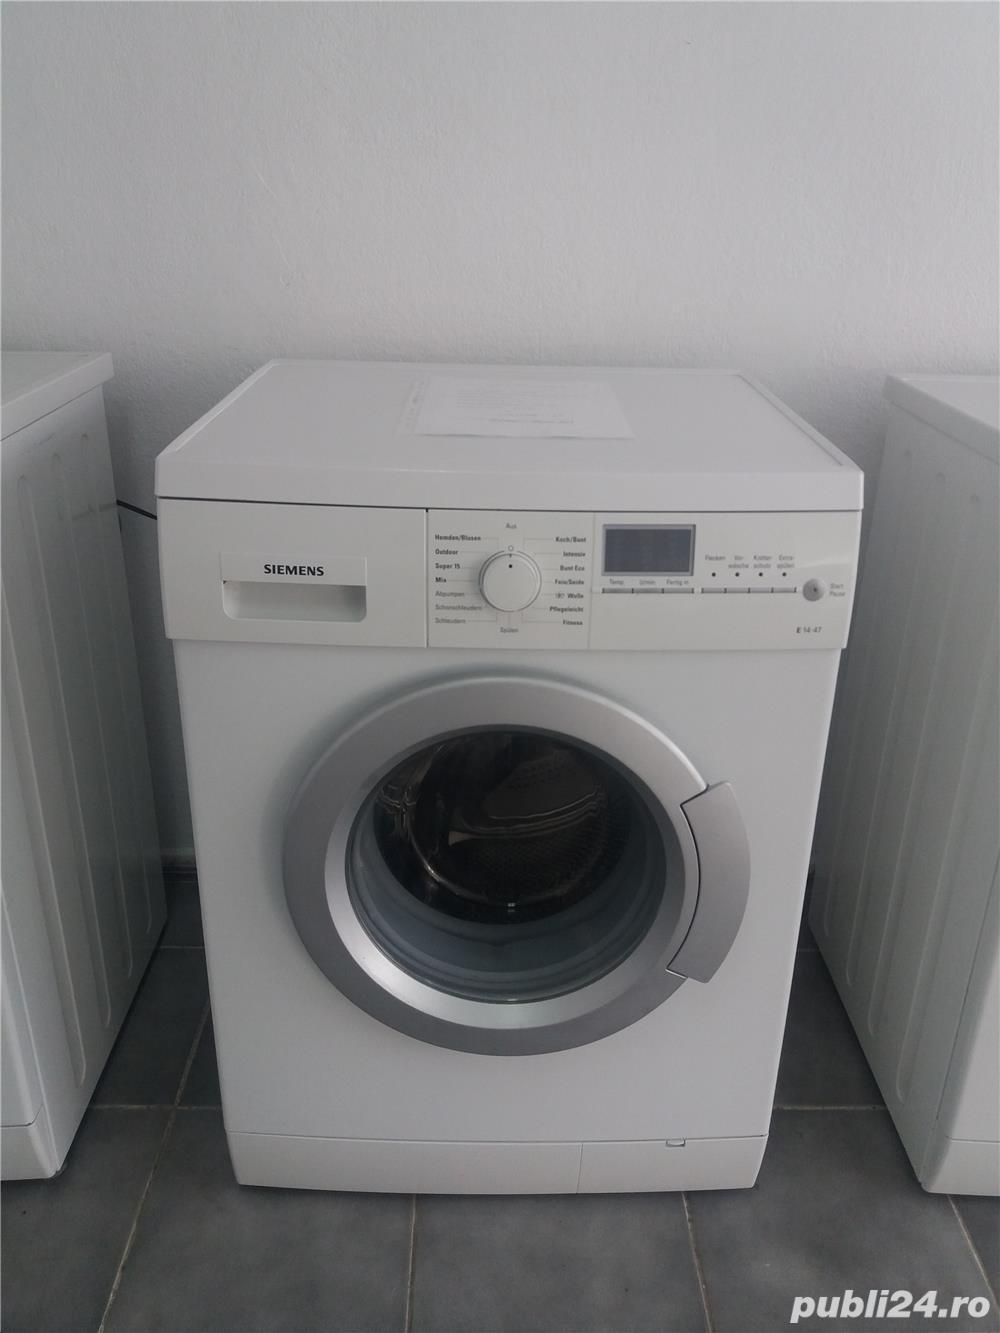 Masina de spălat rufe Siemens. 6 kg. Model nou.